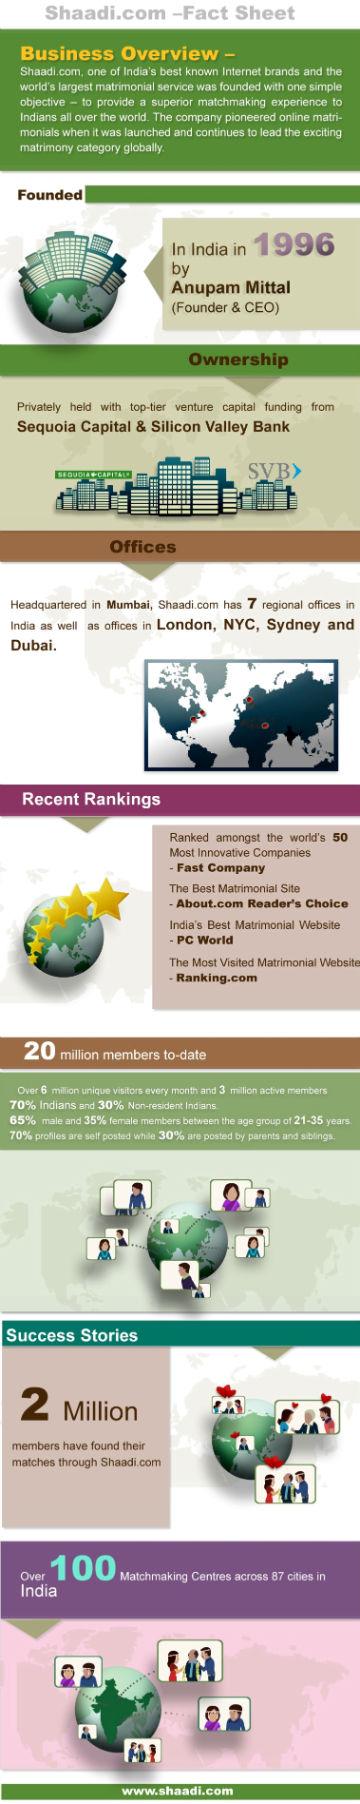 Shaadi.com infographic